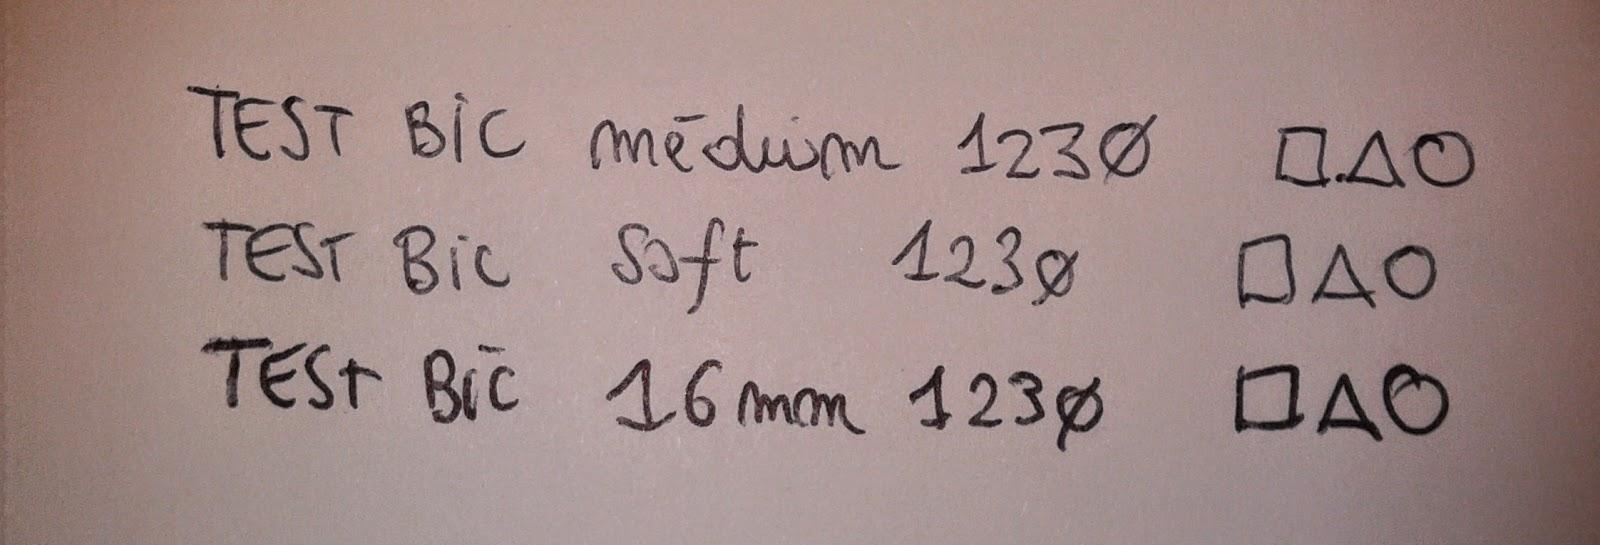 Test - Bic Soft - Bic Medium - Bic Large